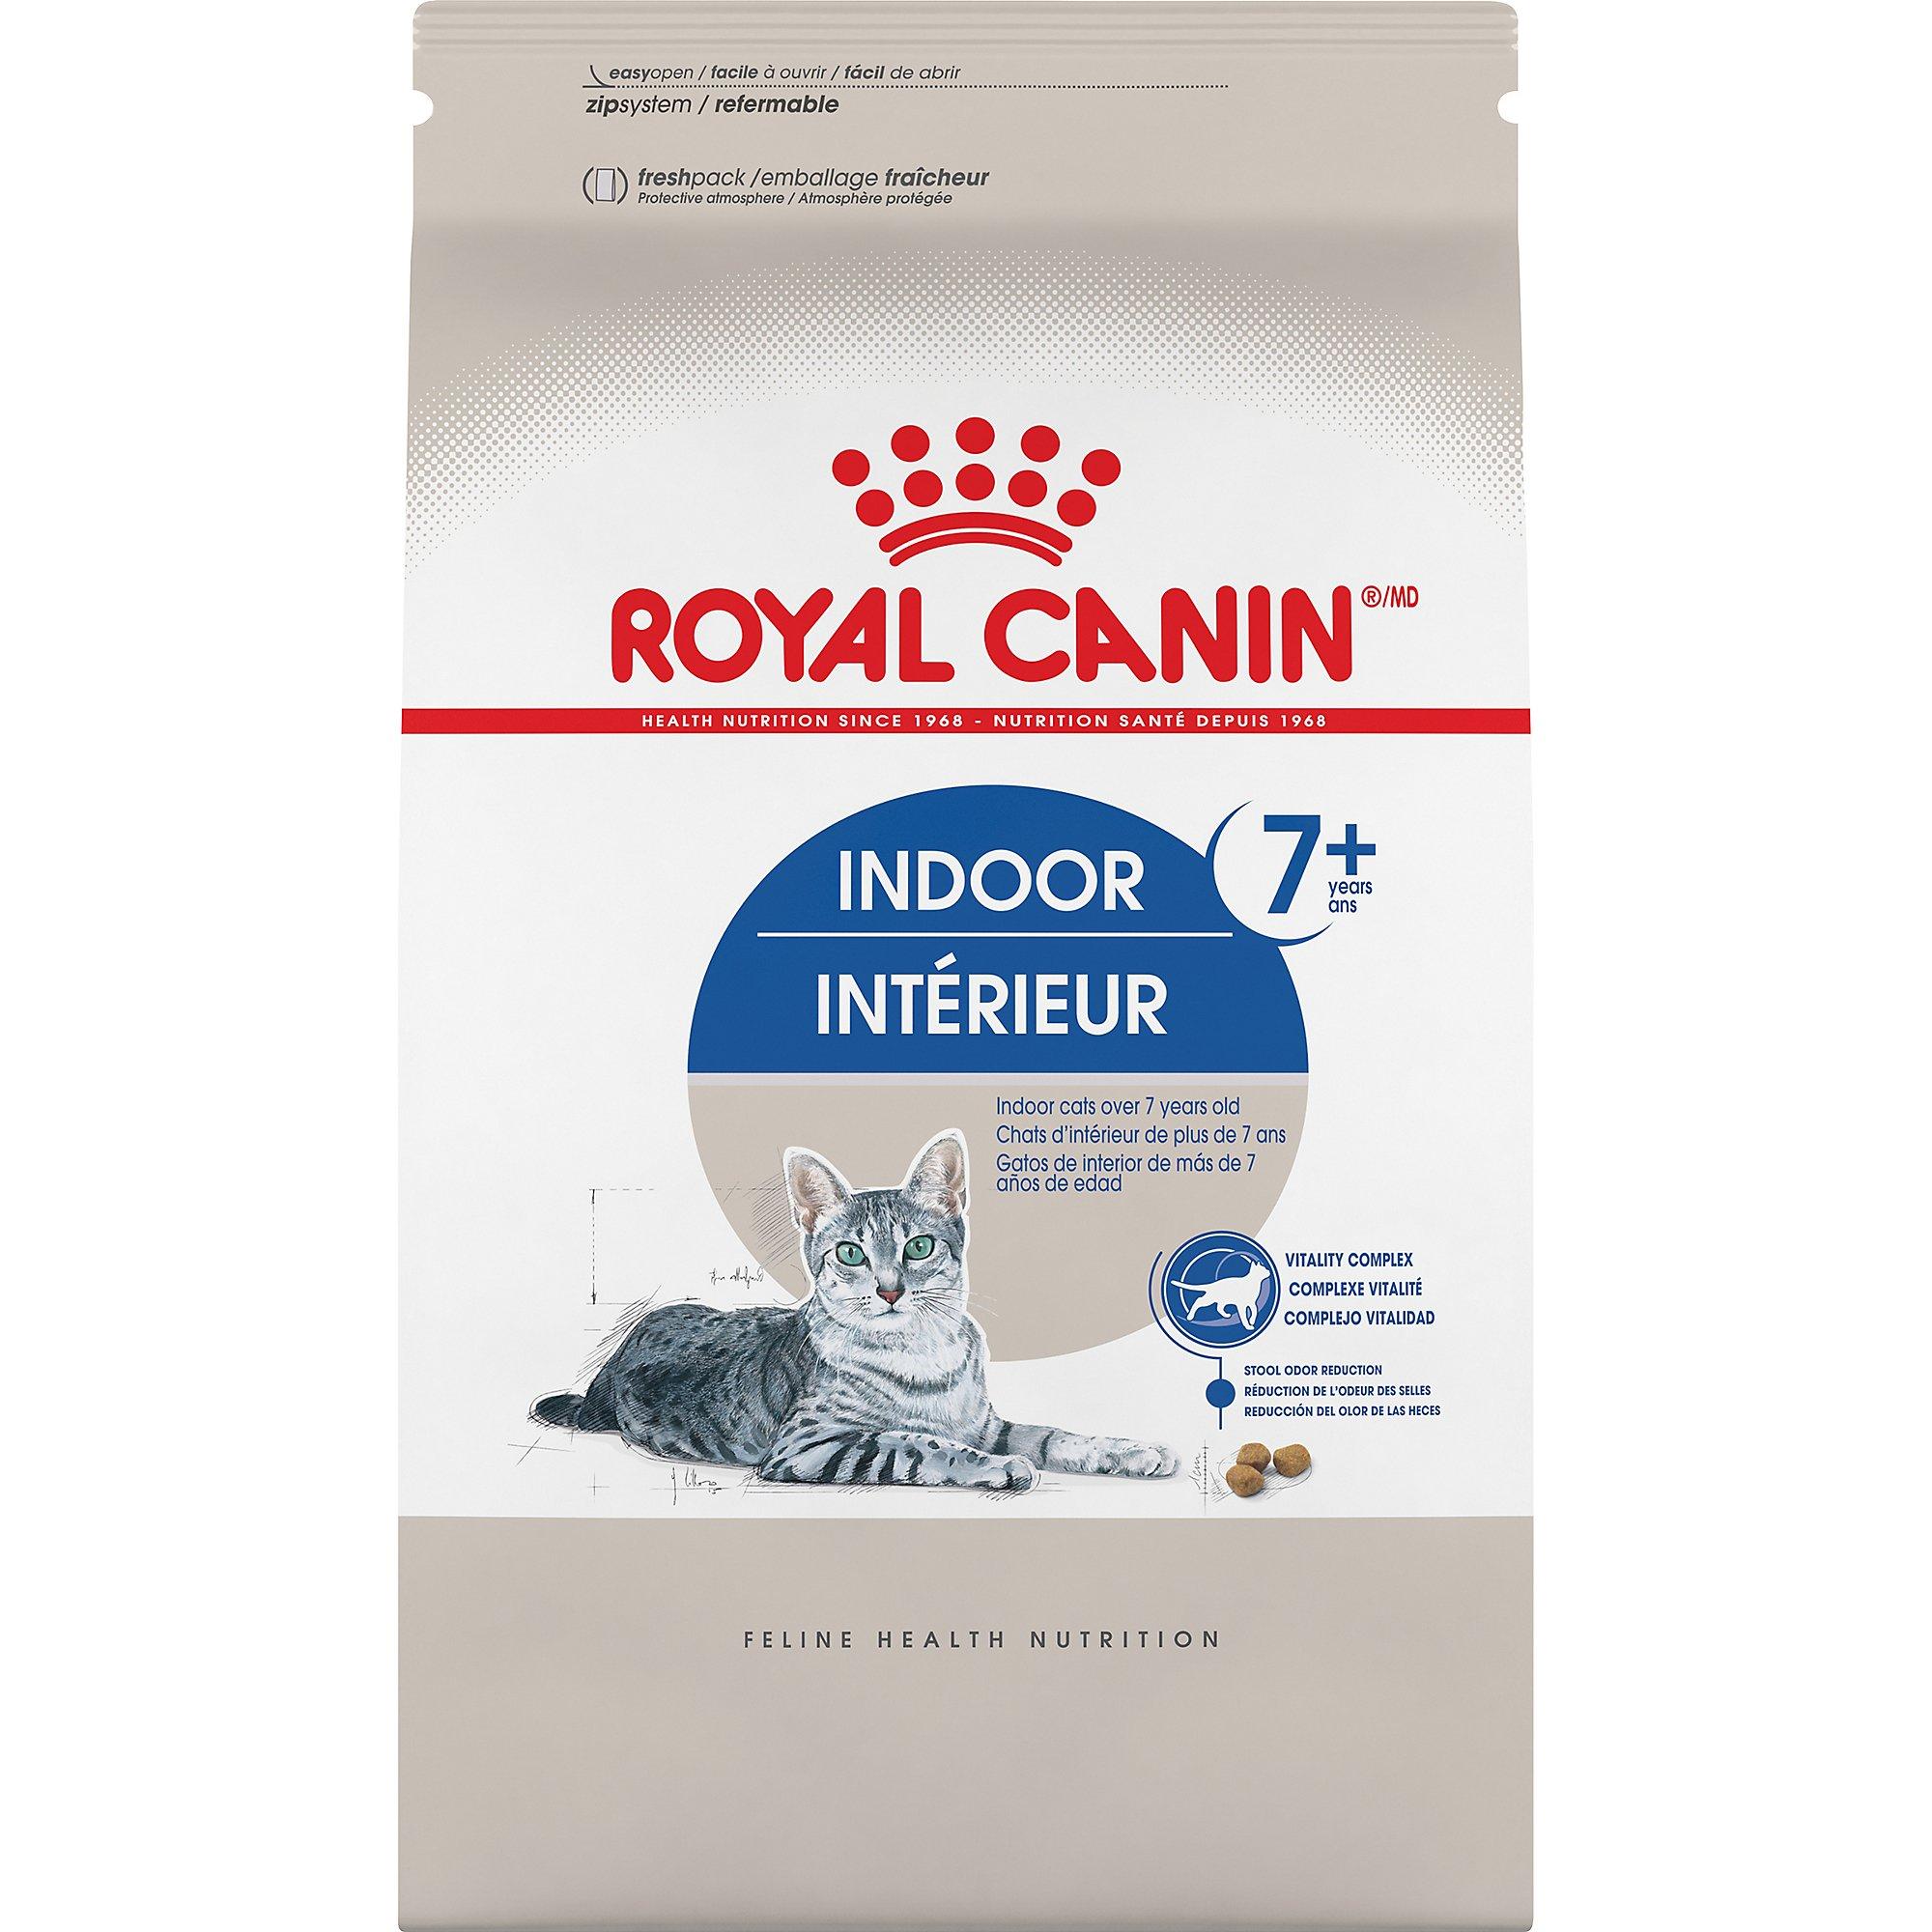 Royal Canin Feline Health Nutrition Indoor  Cat Food